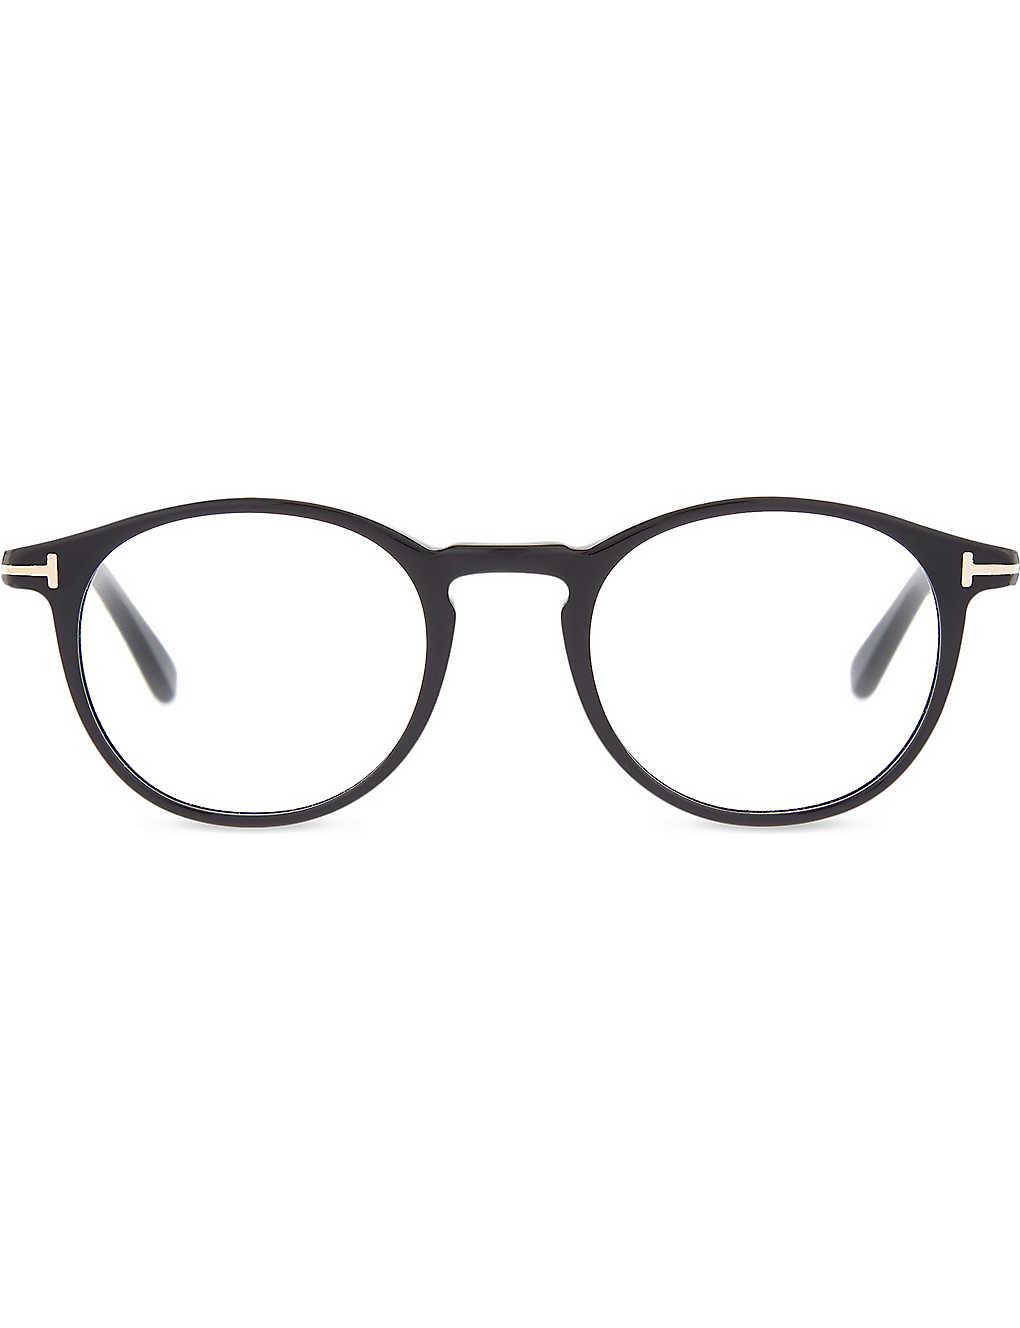 d82f6270dd9e TOM FORD - Tf5294 classic round-frame glasses